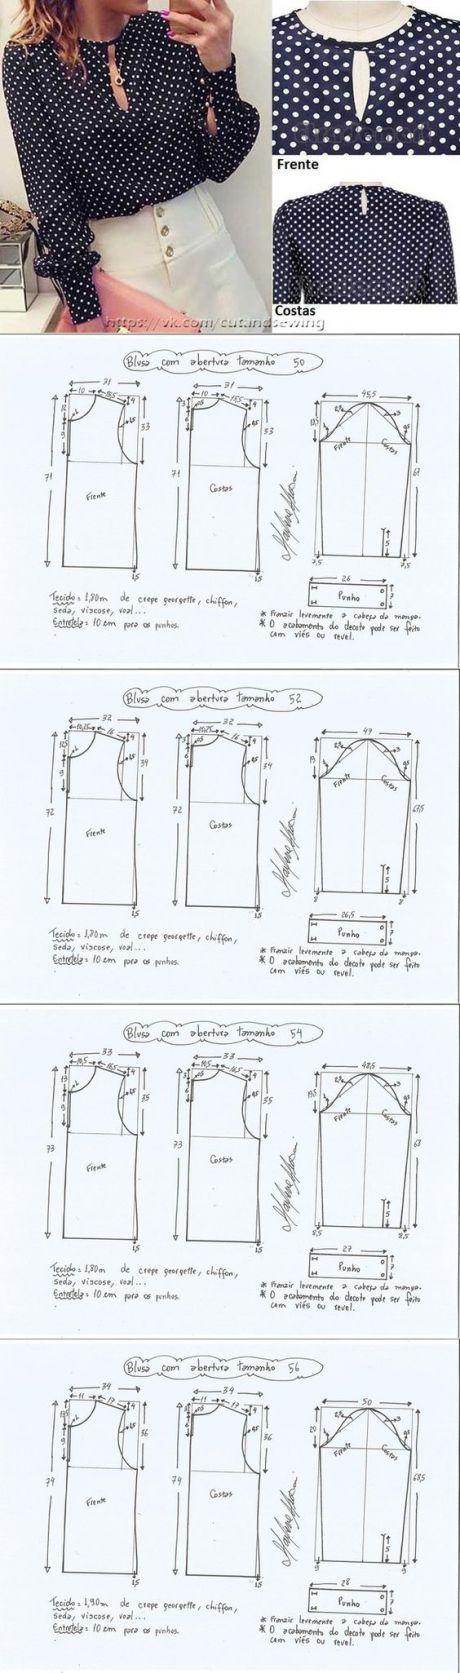 Pinterest | Vestidos Moldes | Pinterest | Patrones, Costura y Blusas